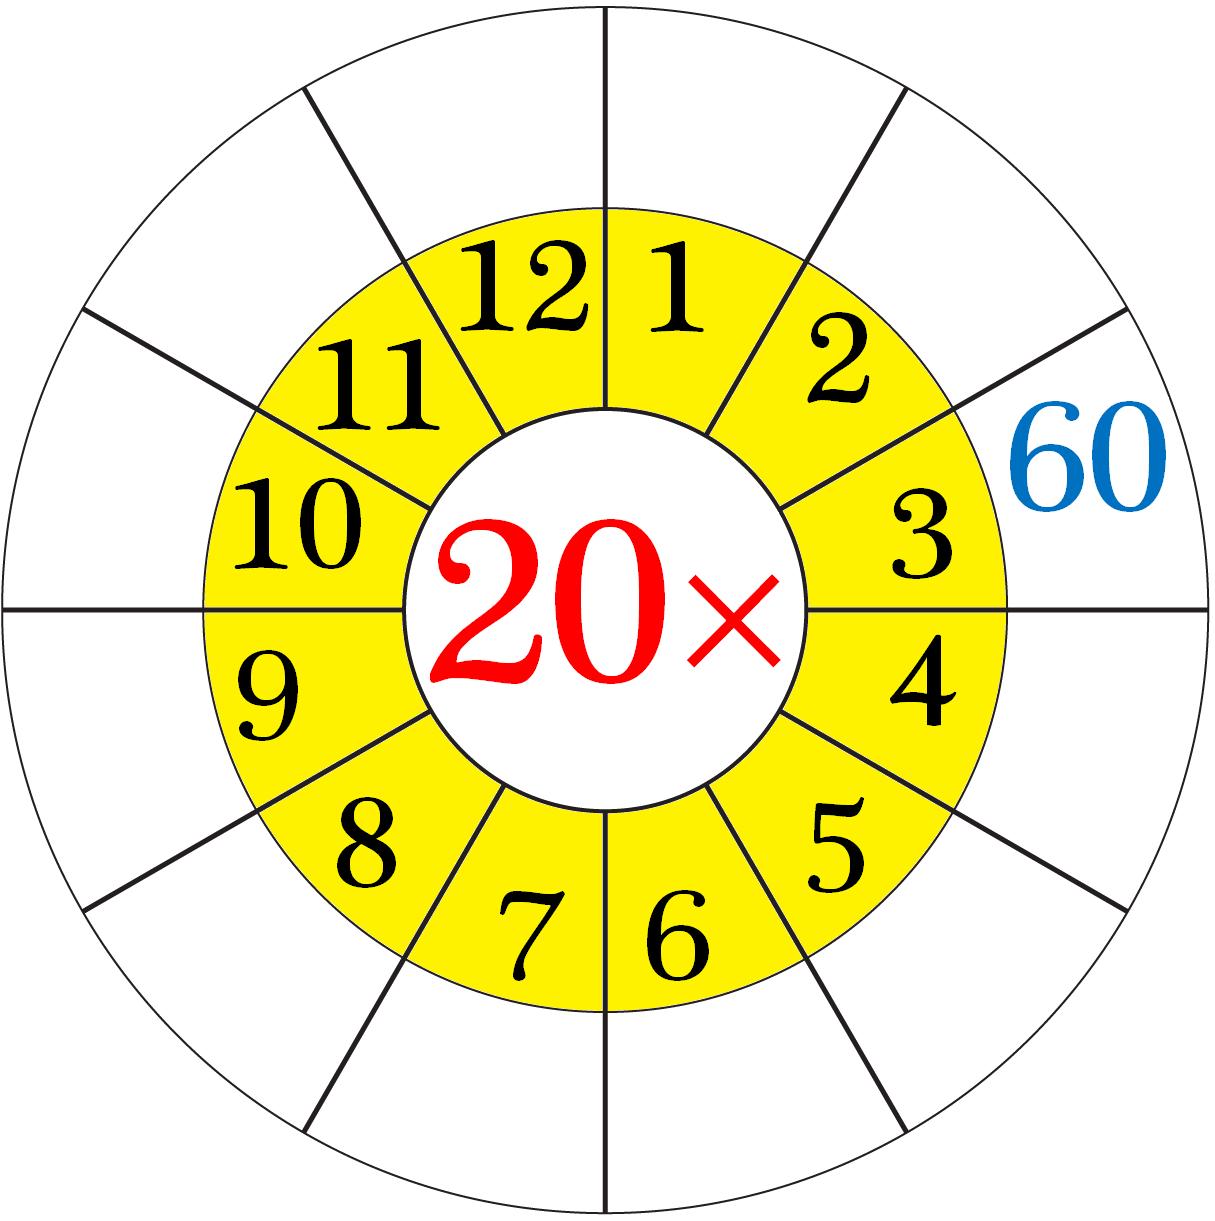 Worksheet on Multiplication Table of 20